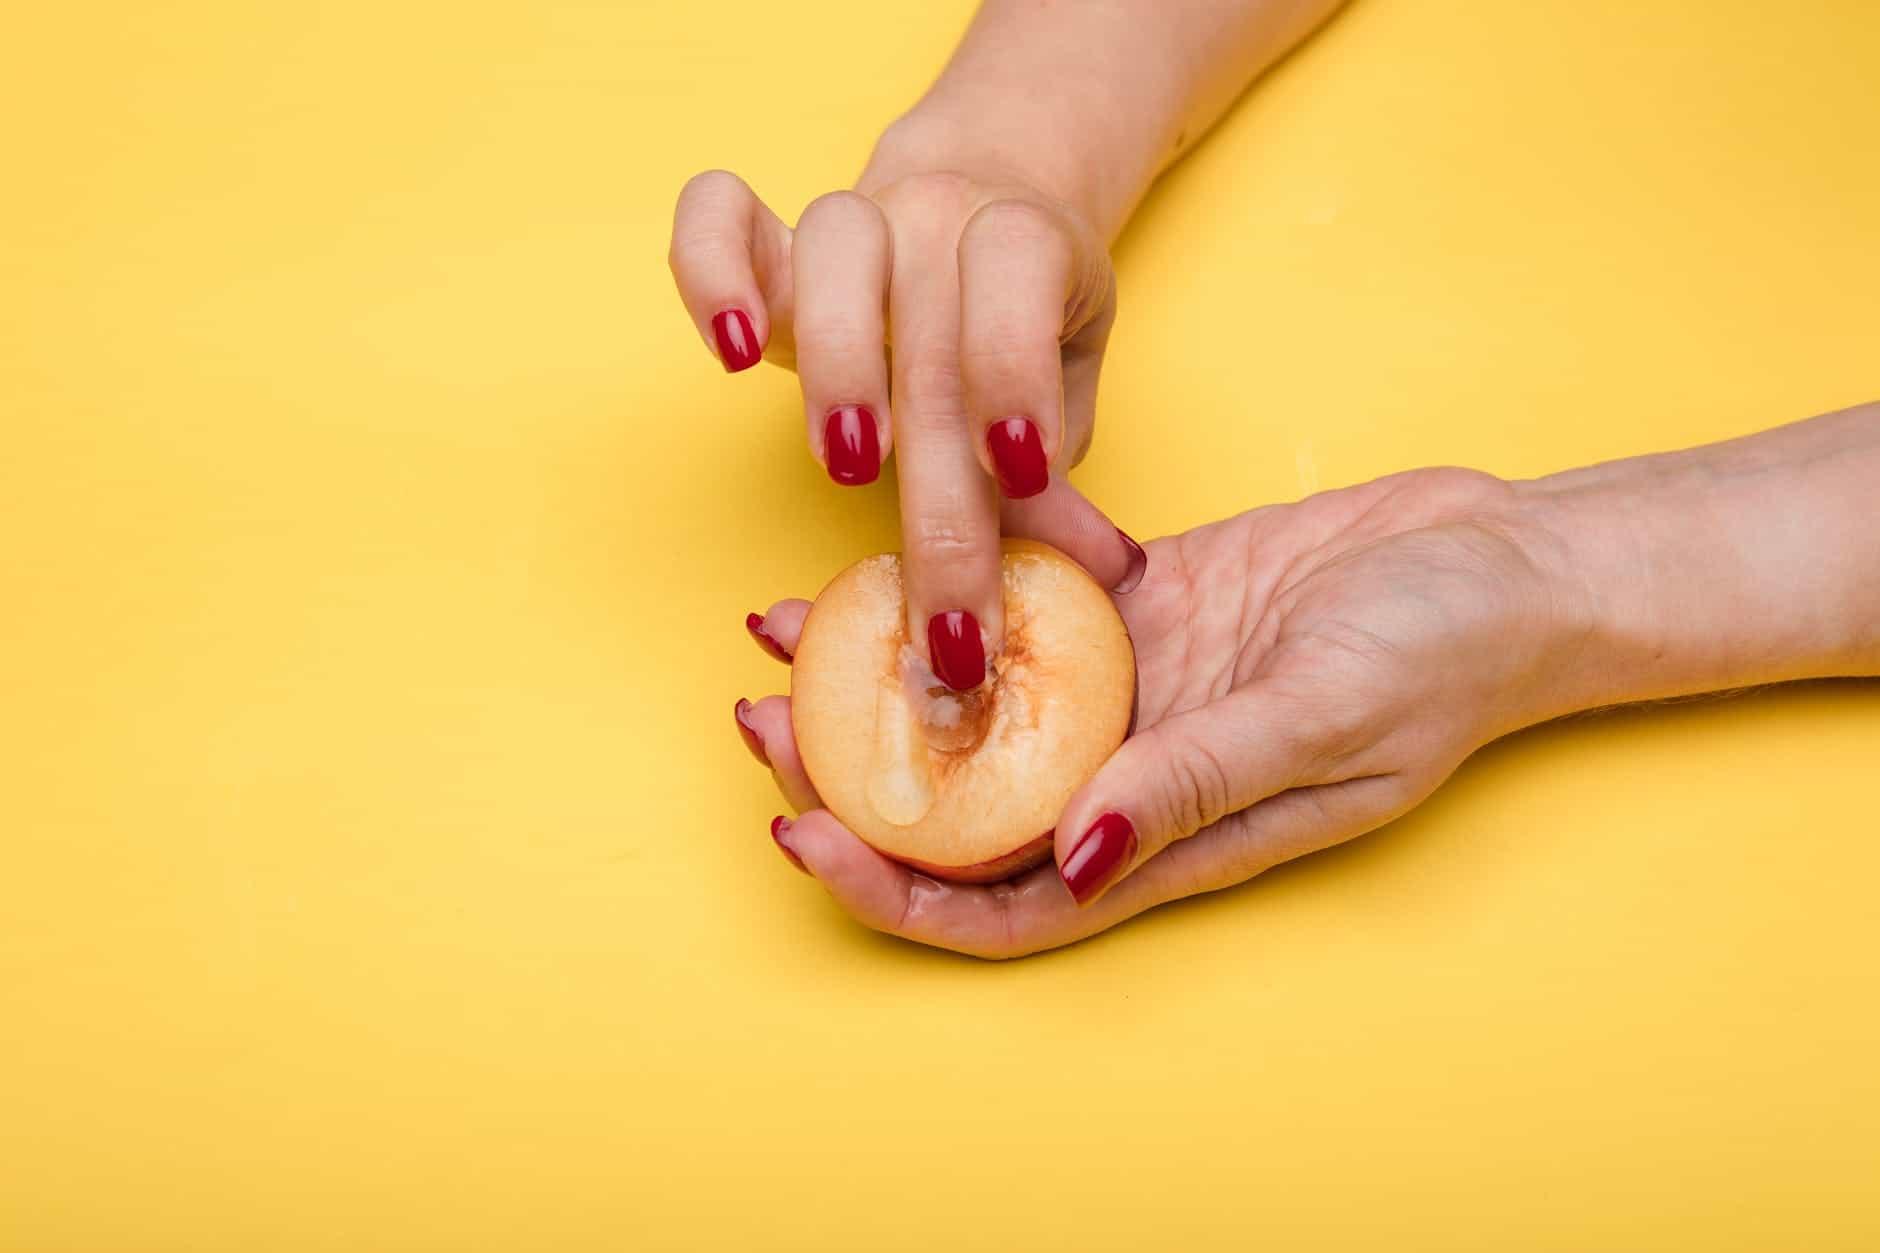 Finger a Lady